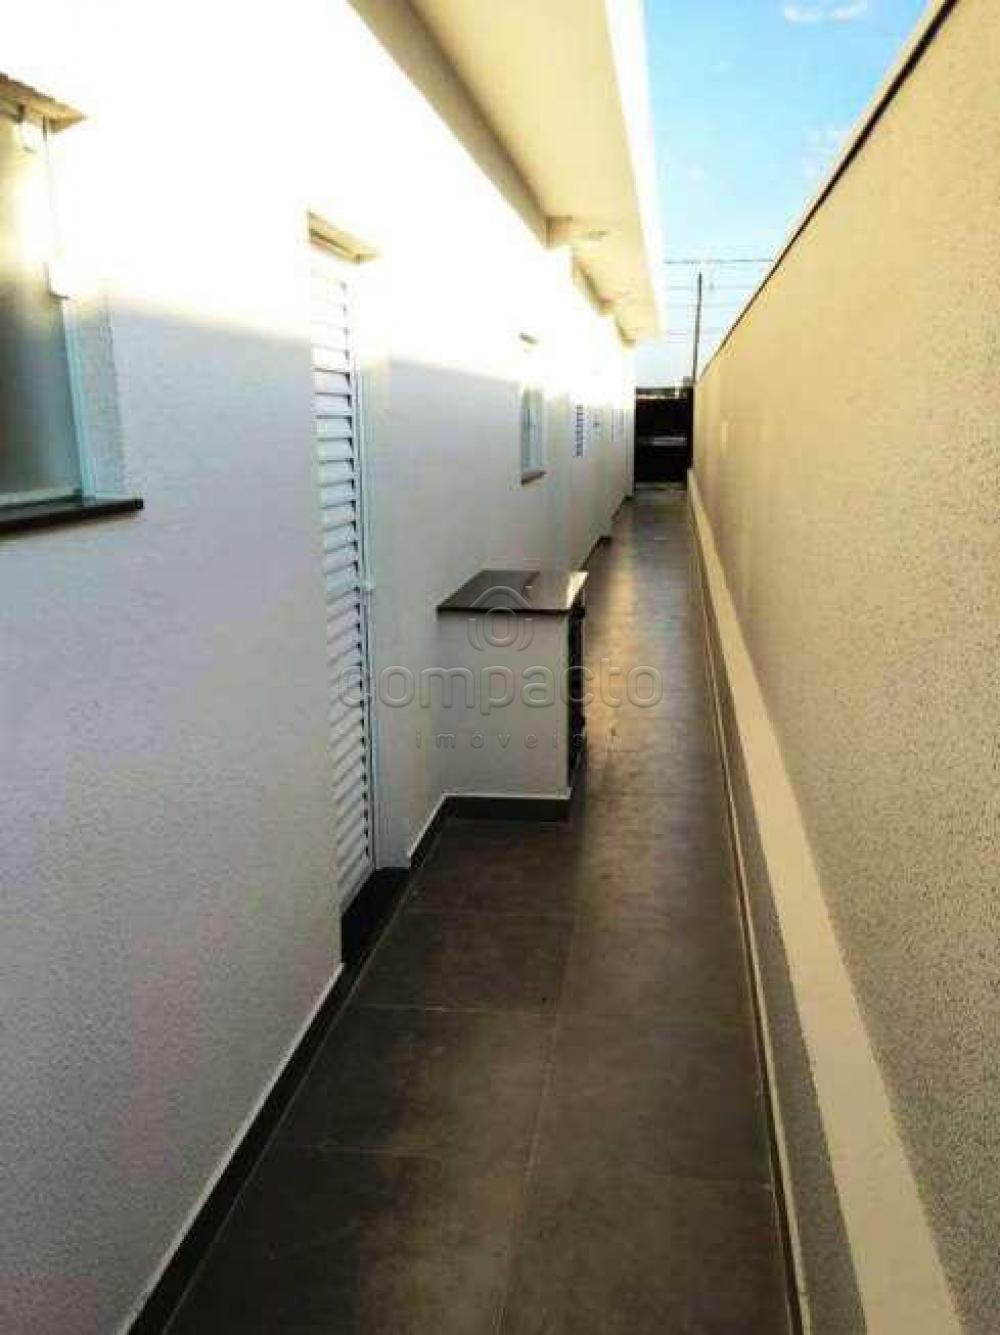 Comprar Casa / Condomínio em Bauru apenas R$ 850.000,00 - Foto 32